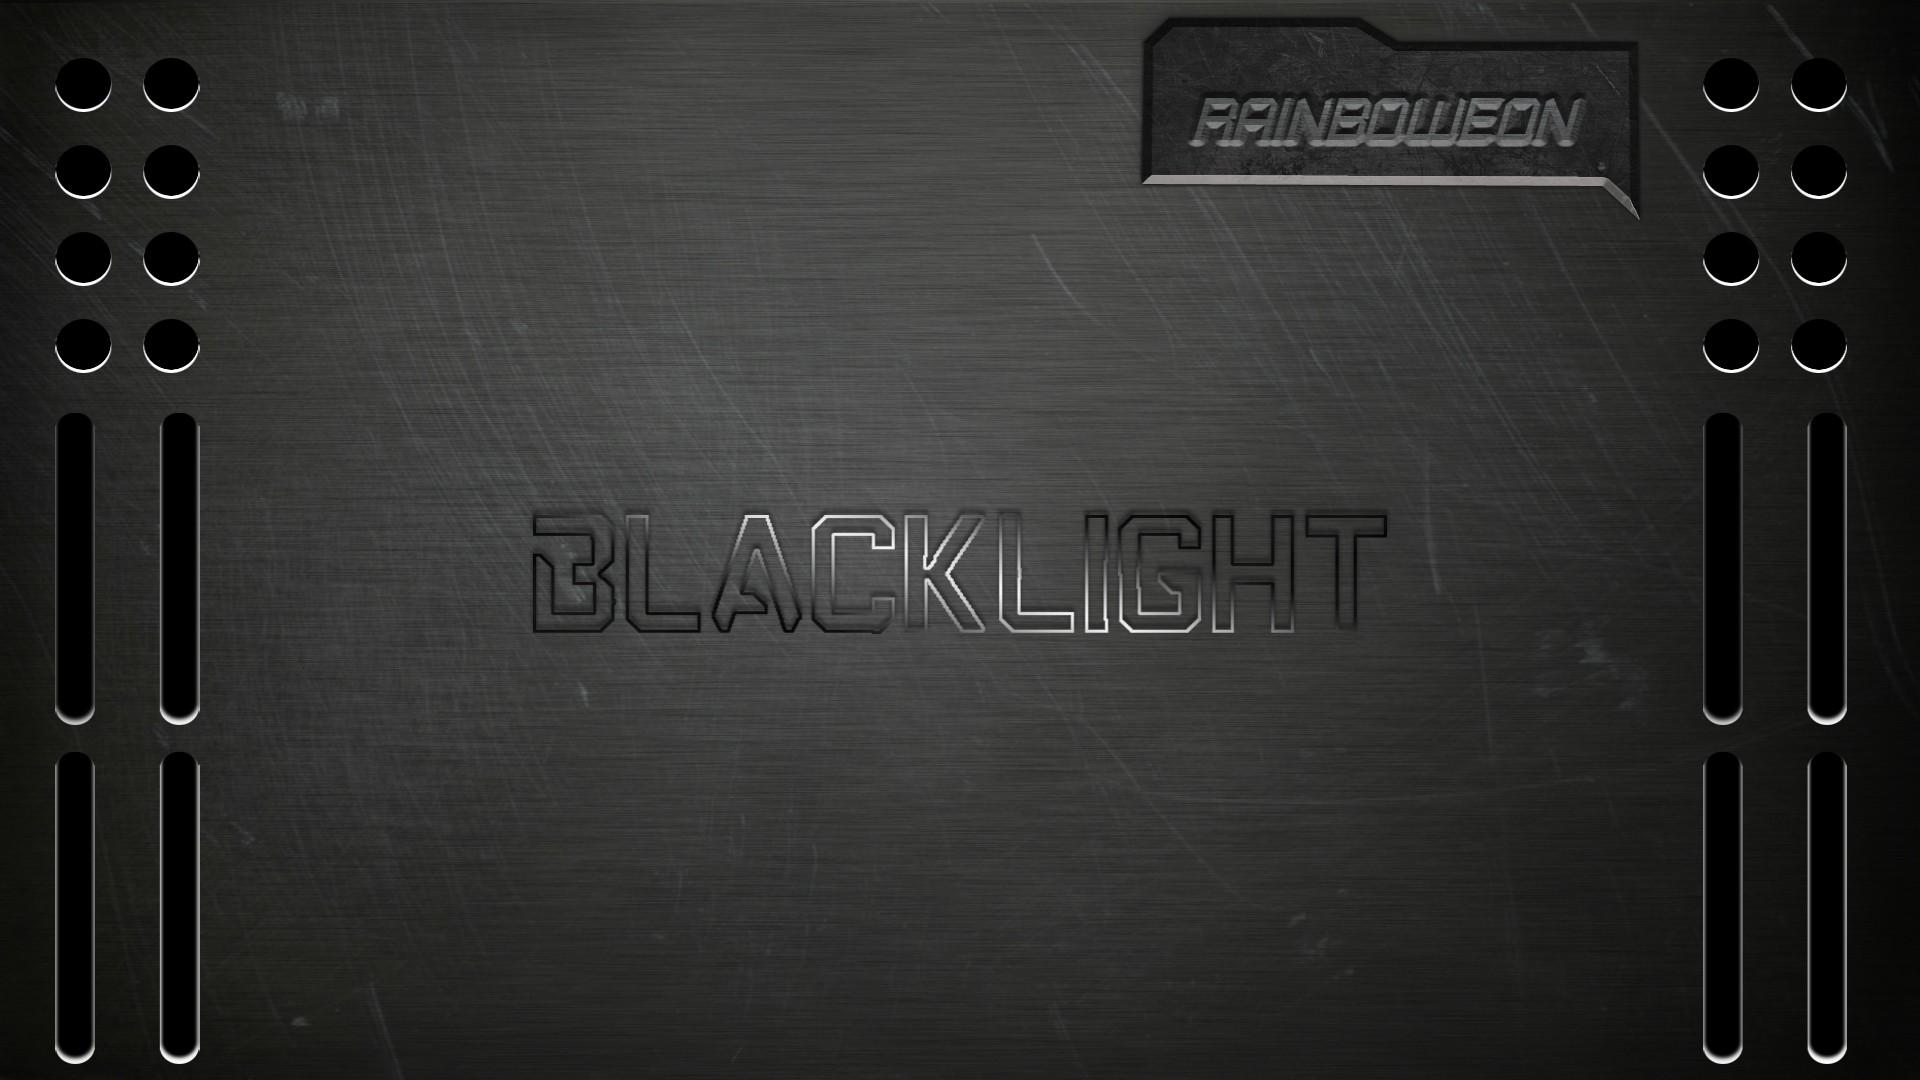 Black White Nike Wallpaper HD 11860 Wallpaper High Resolution 1920x1080